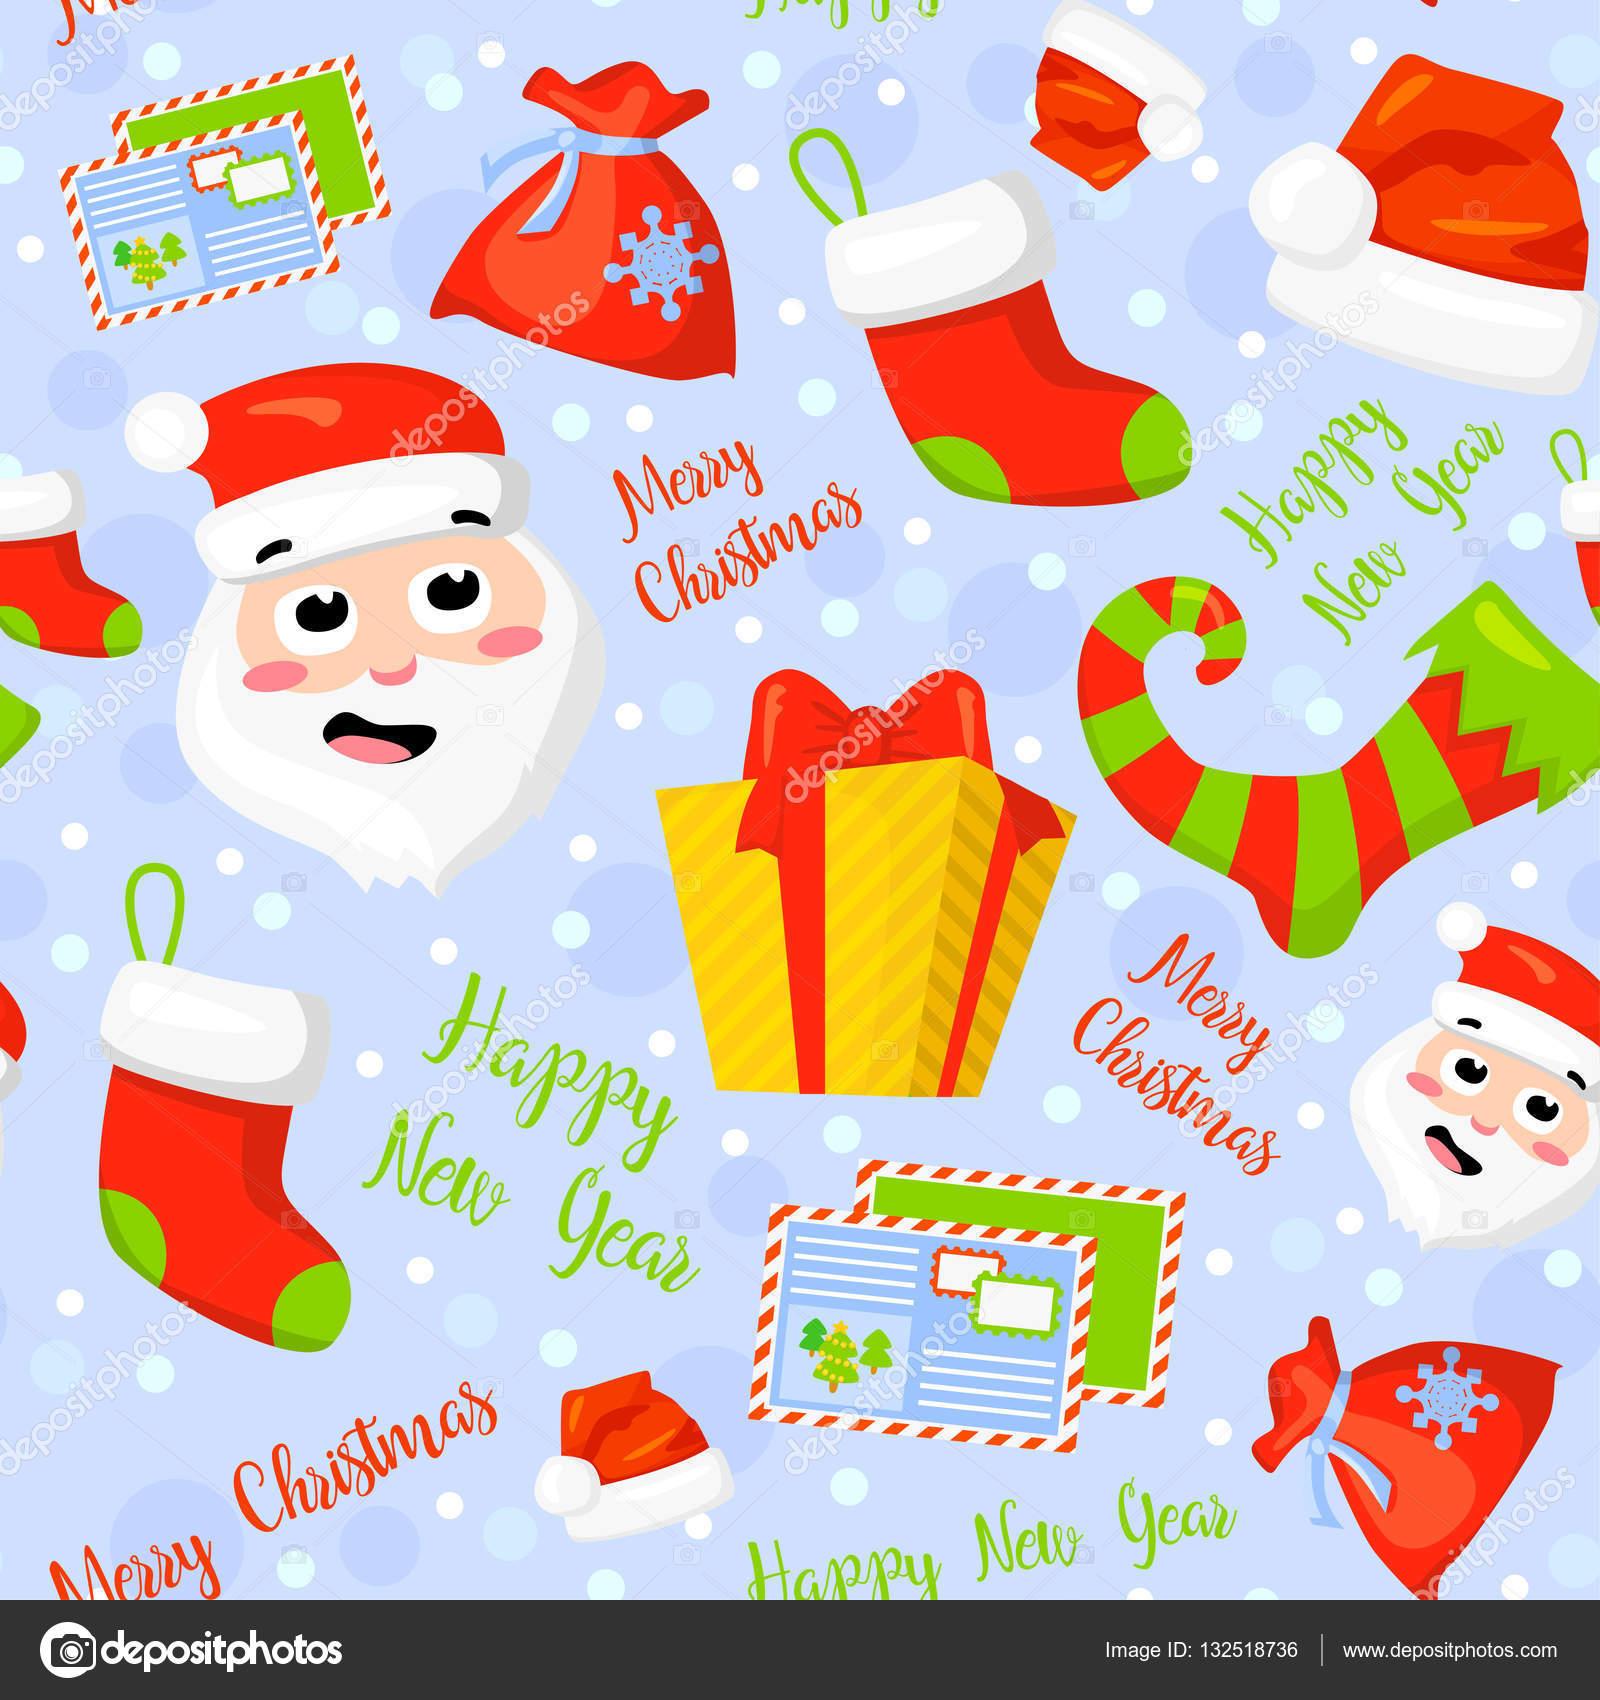 Seamless pattern with cute cartoon christmas mittens candy cane seamless pattern with cute cartoon christmas mittens candy cane holly berries smiling snowman biocorpaavc